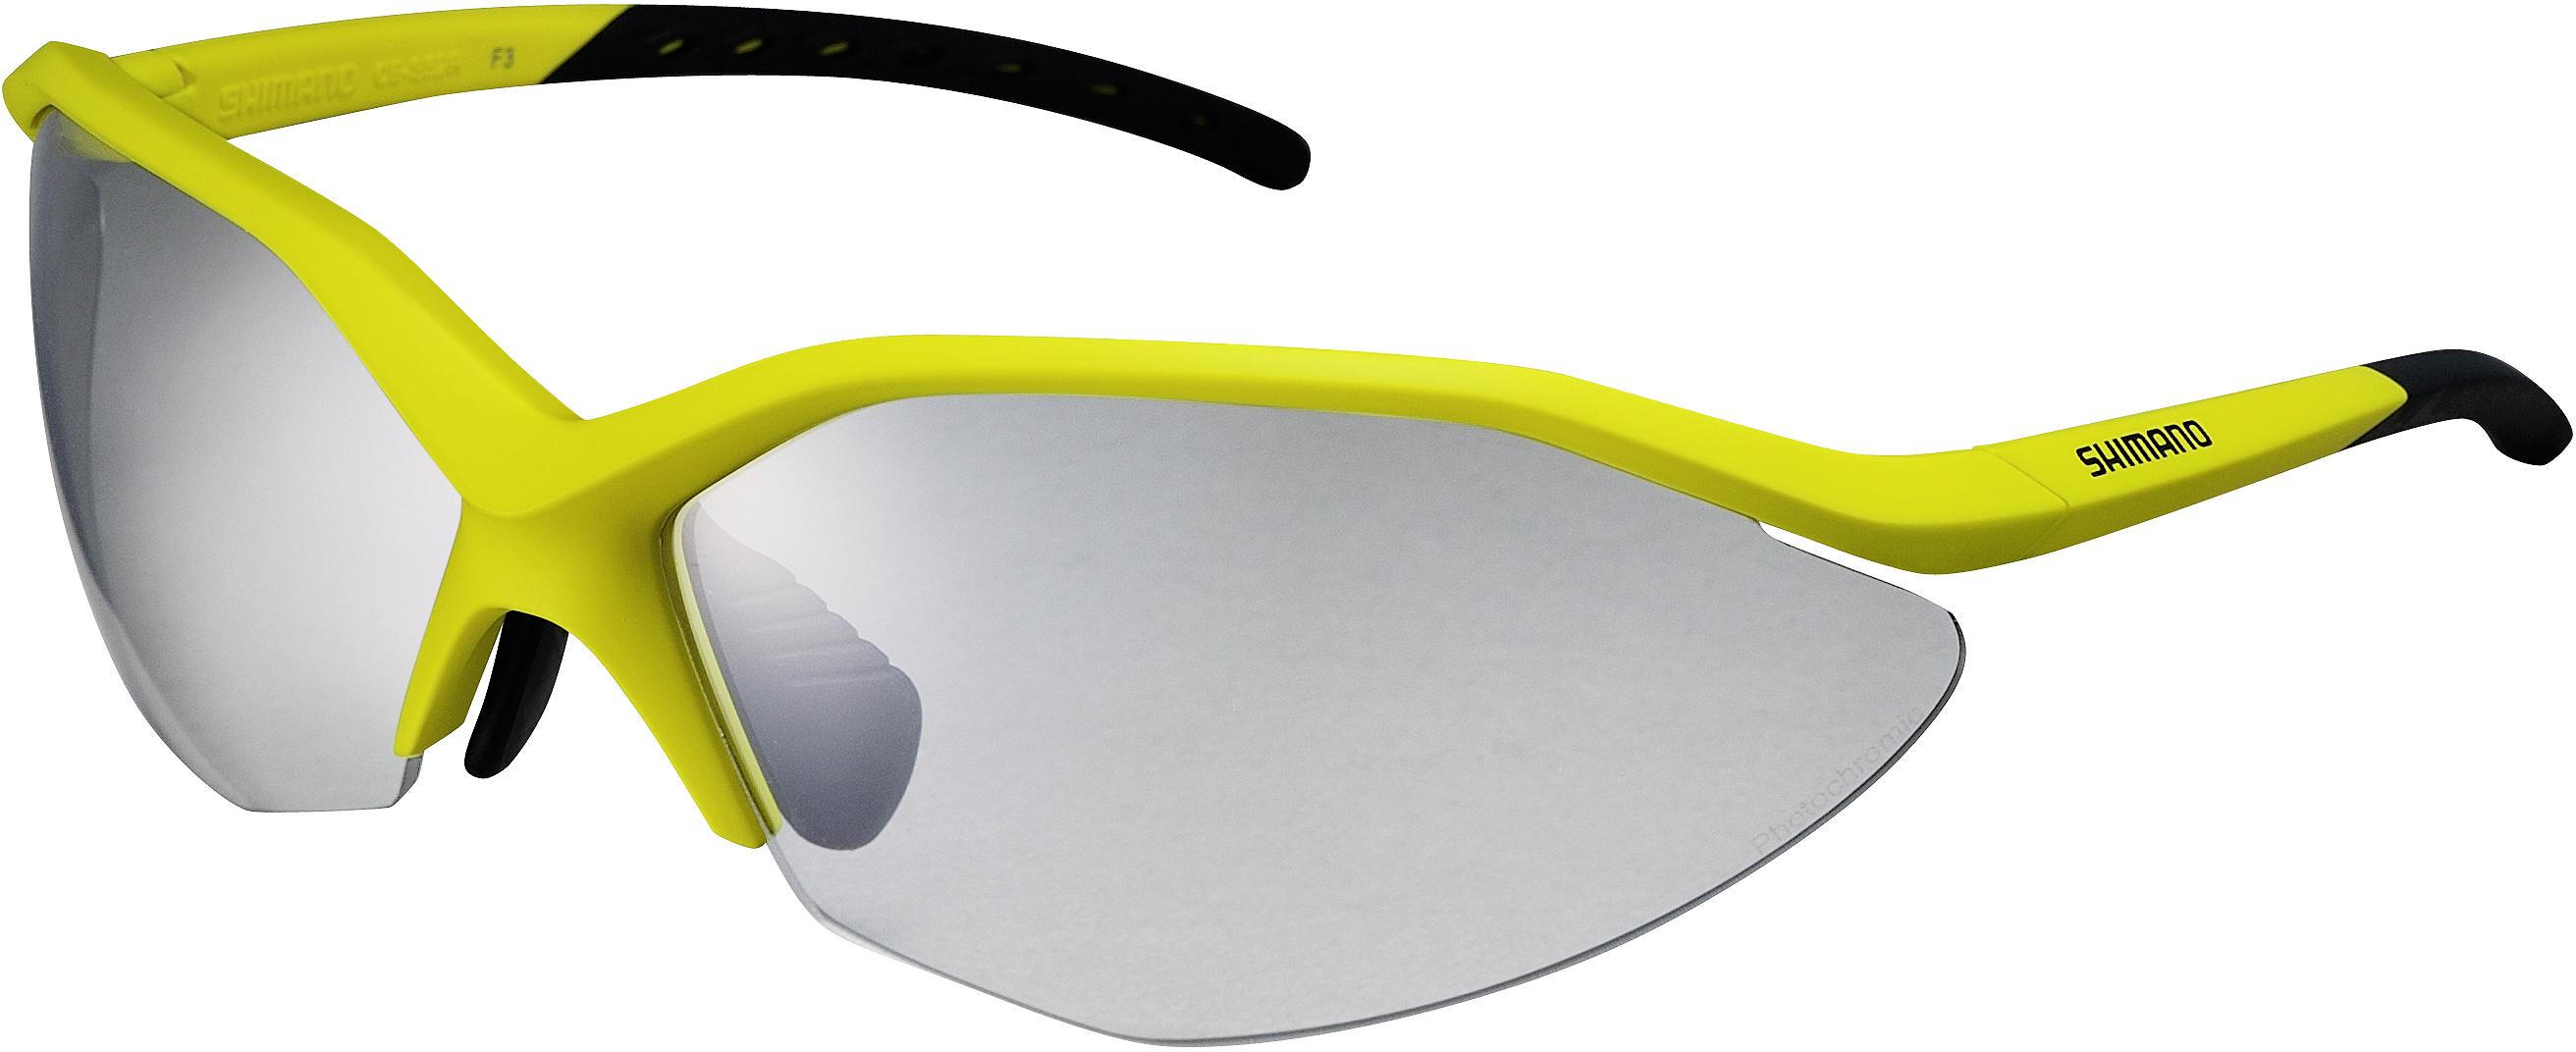 SHIMANO brýle S52R, Limežlutá/černá, skla fotochromatická šedá